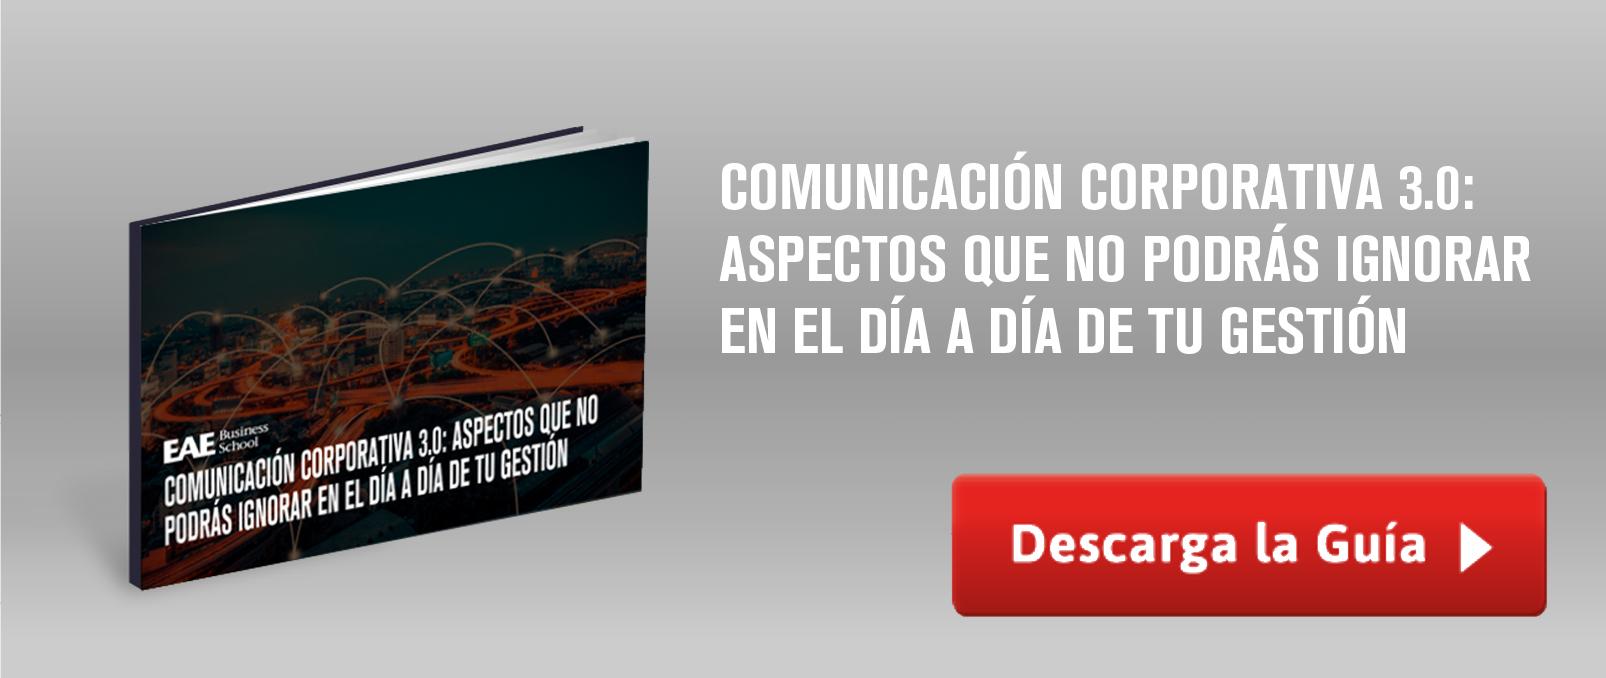 TOFU - Comunicación corporativa 3.0